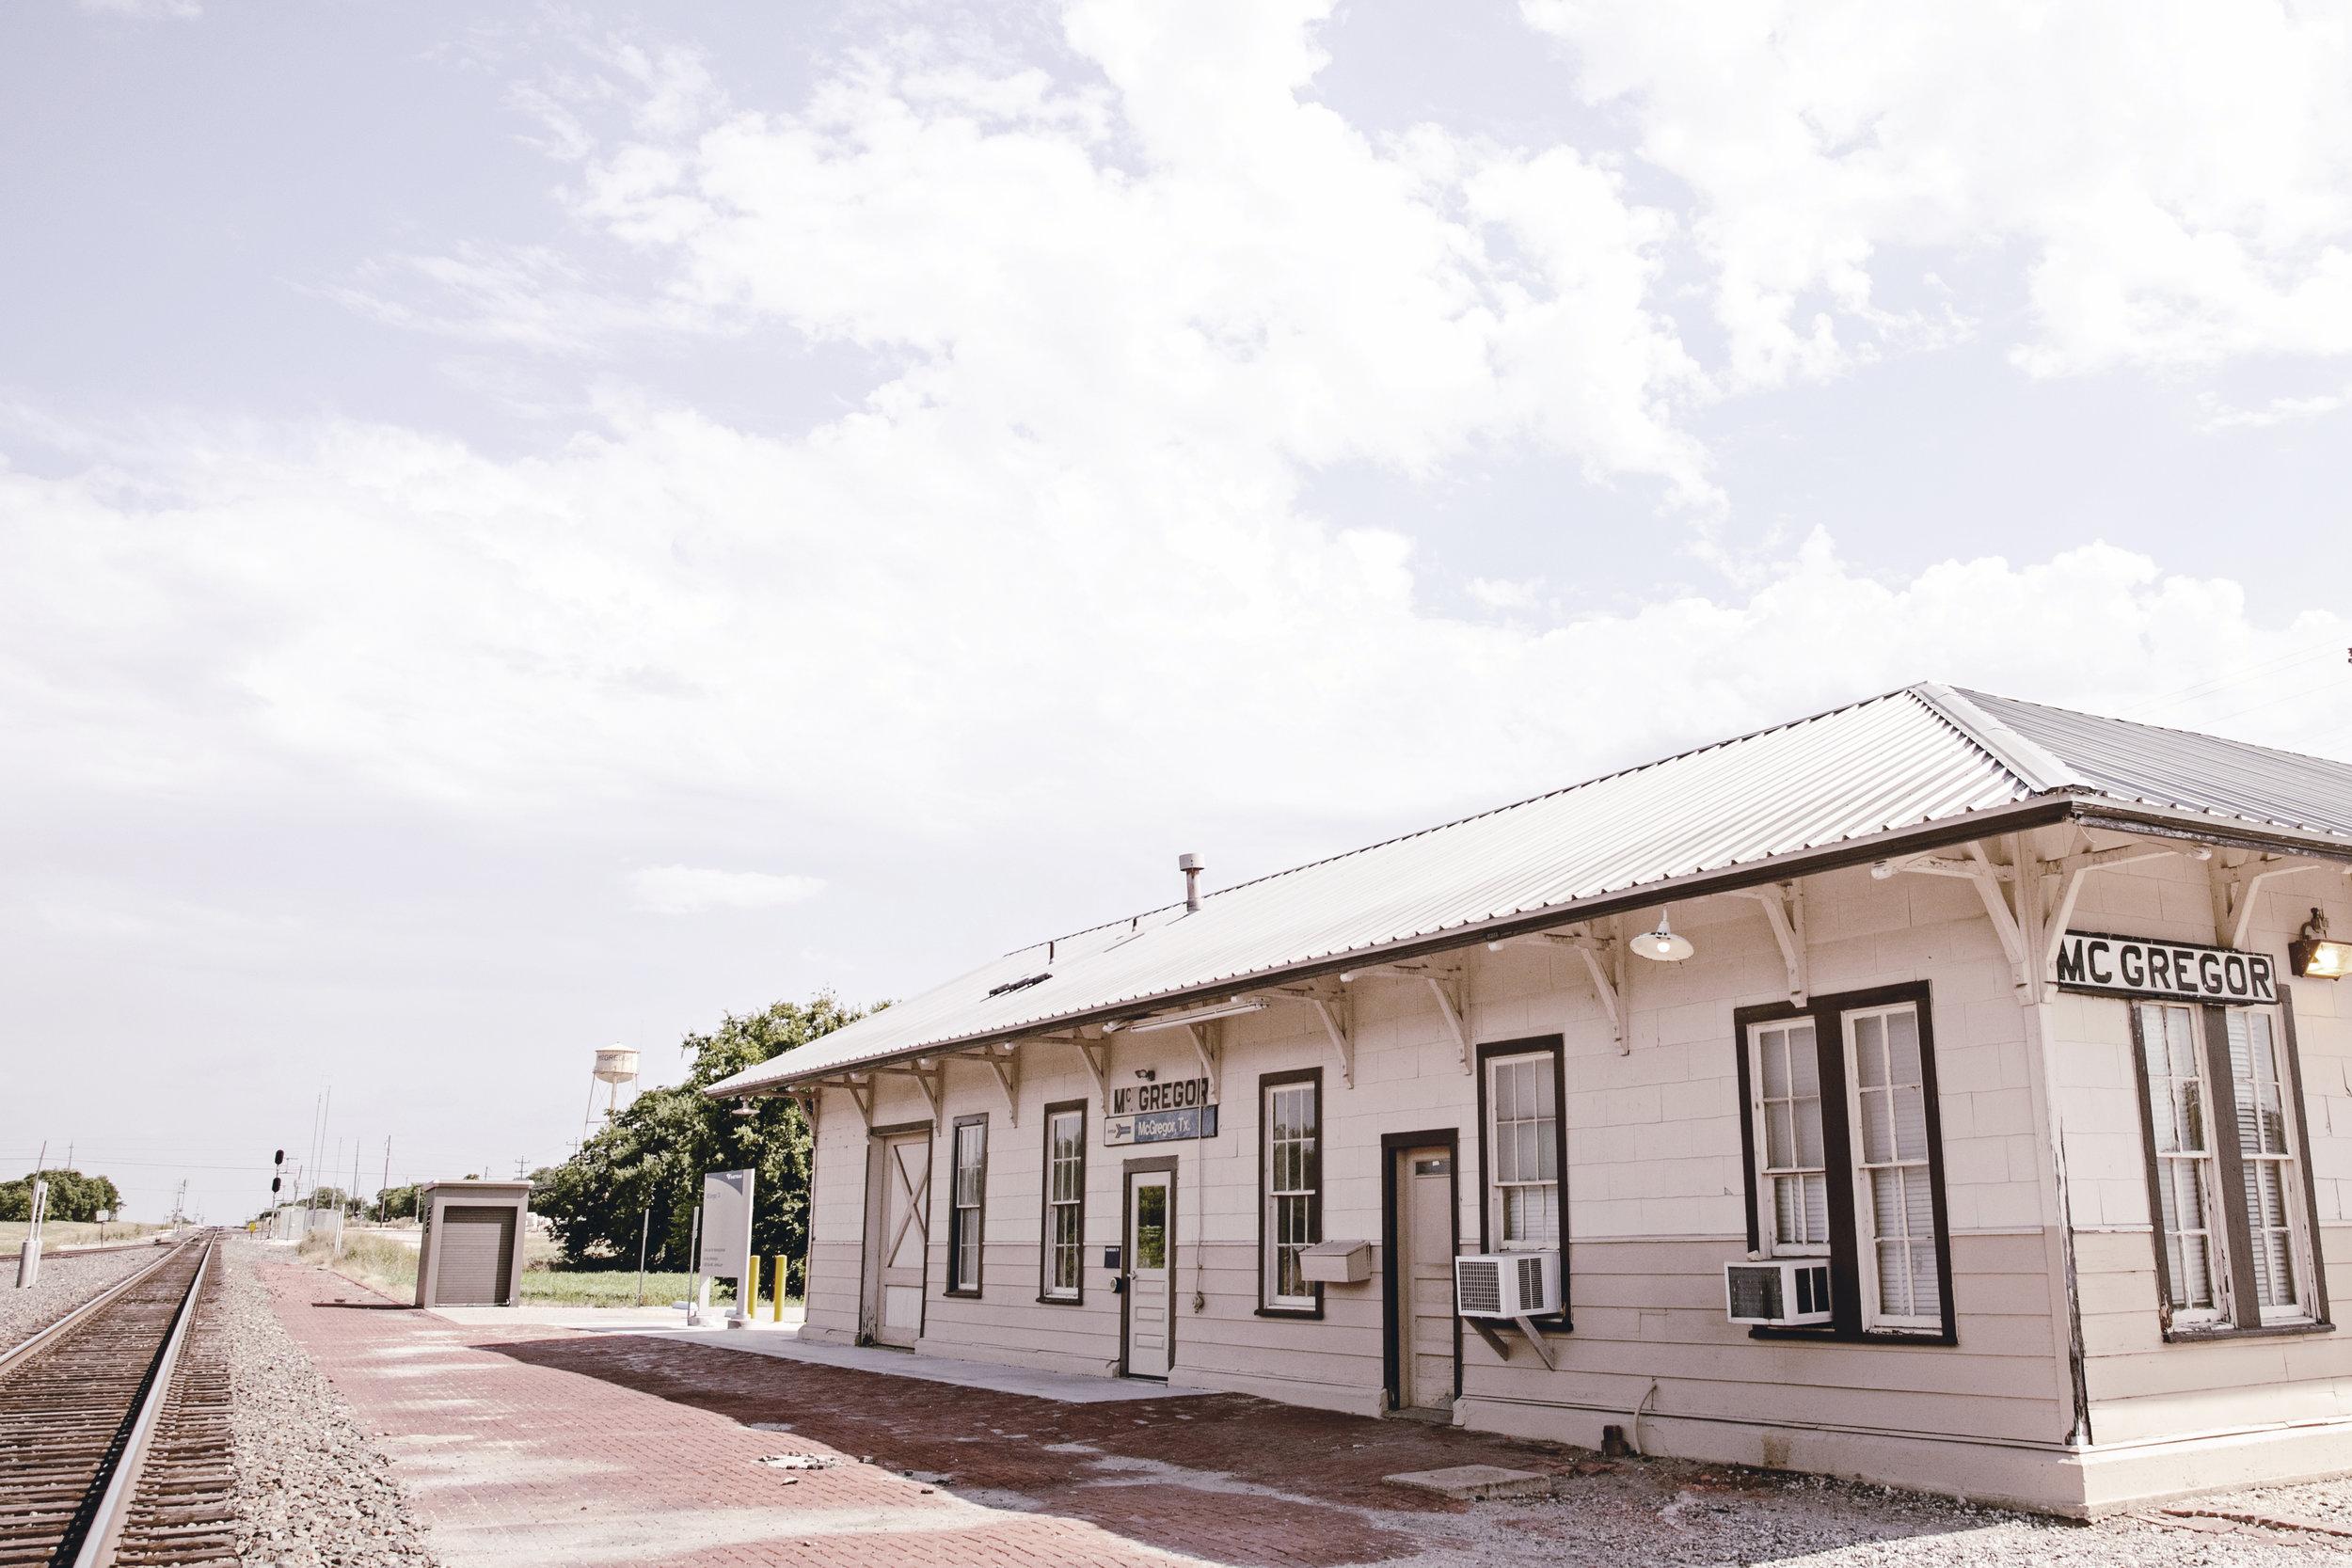 McGregor texas train station / heirloomed travel